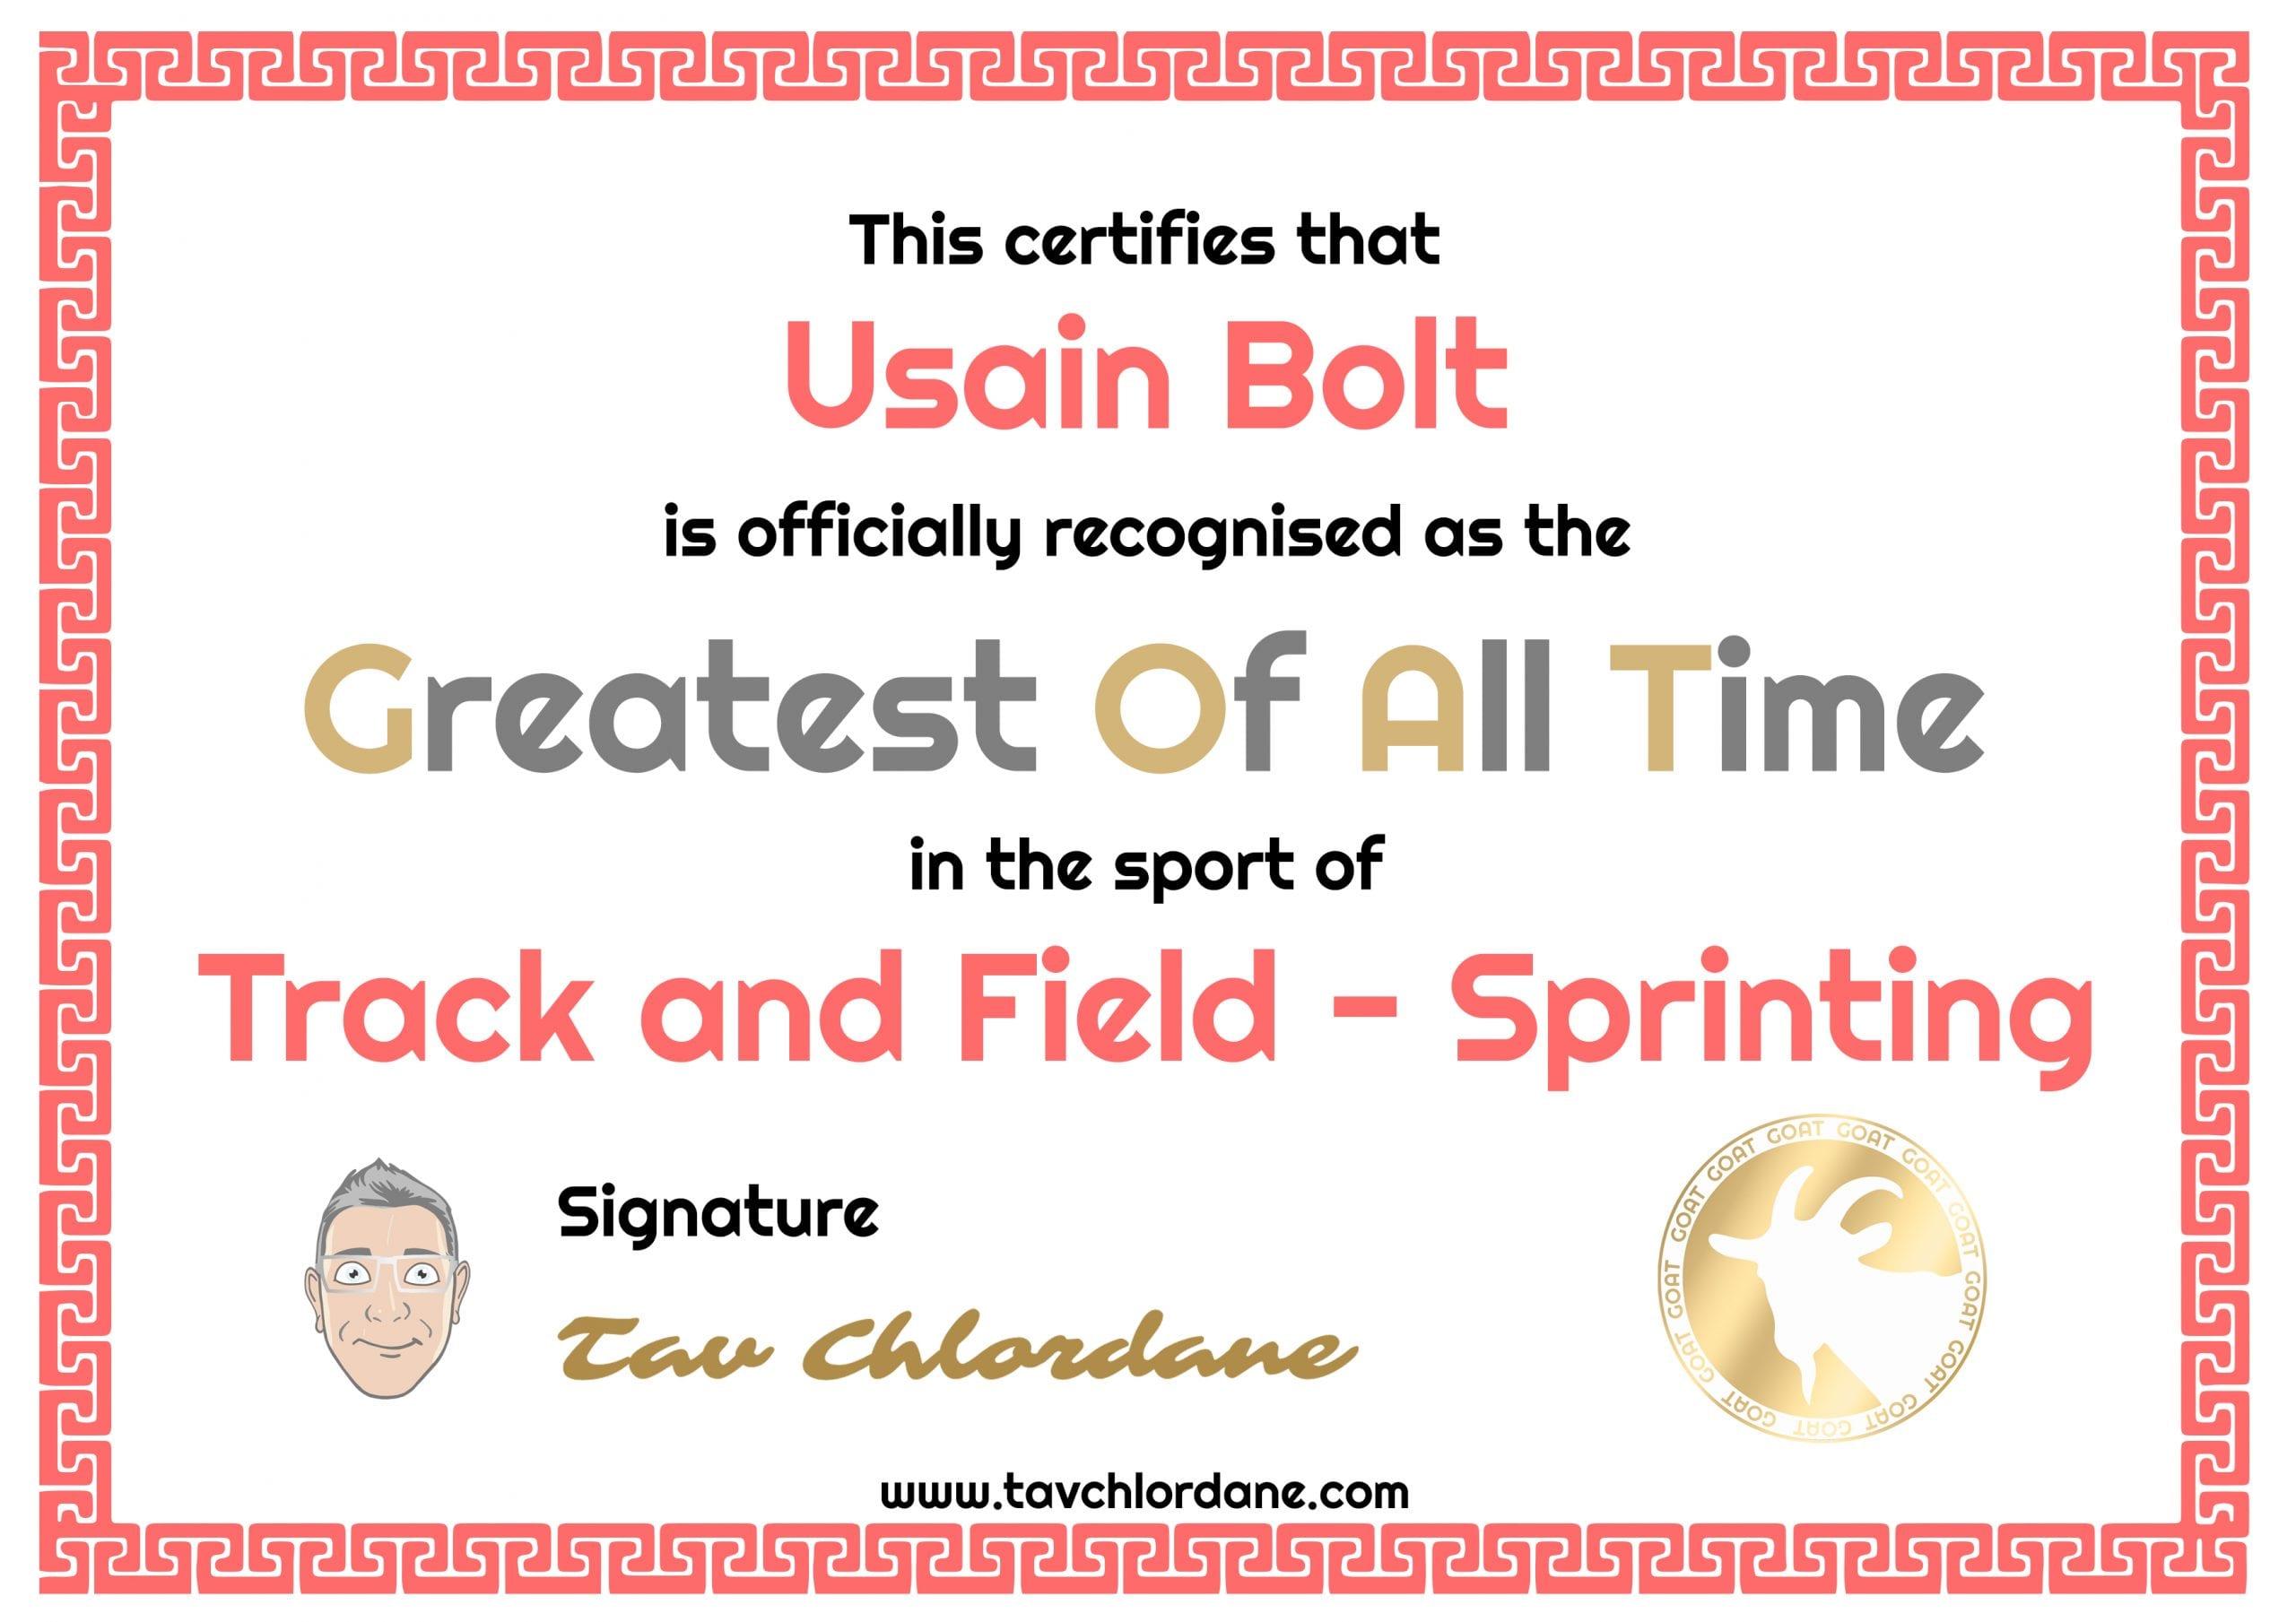 Greatest sprinter of all time Usain Bolt